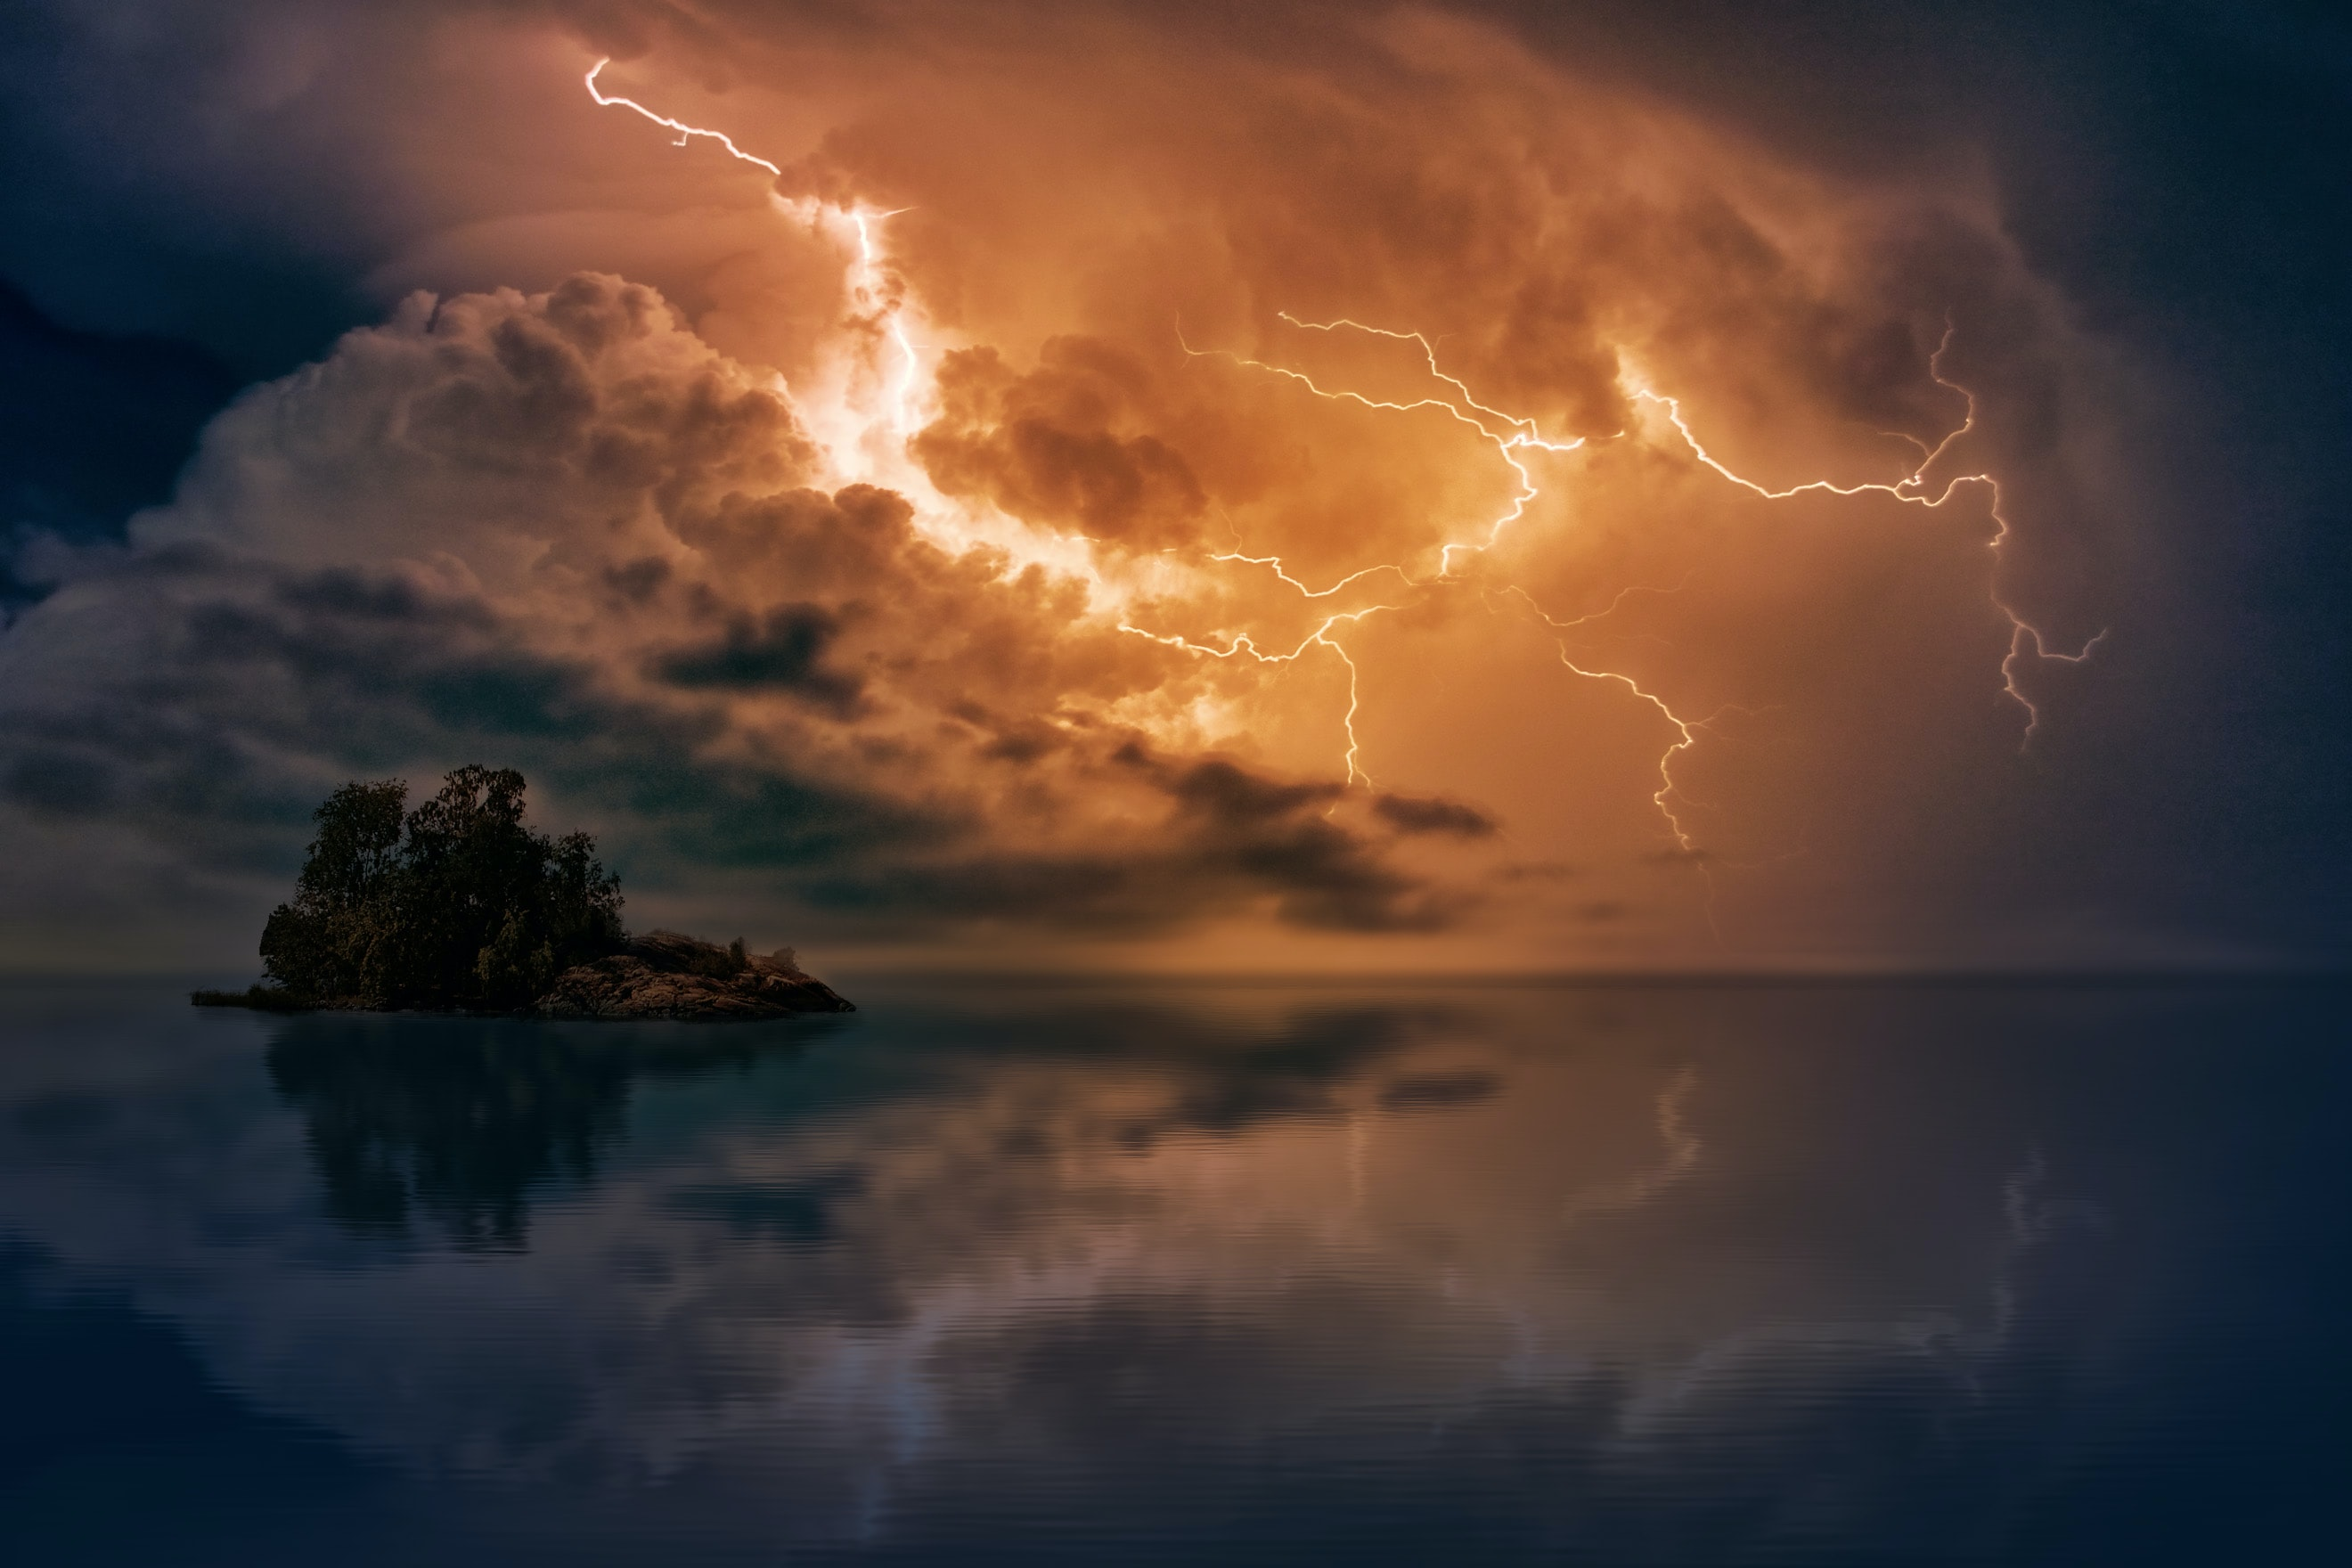 A storm stories